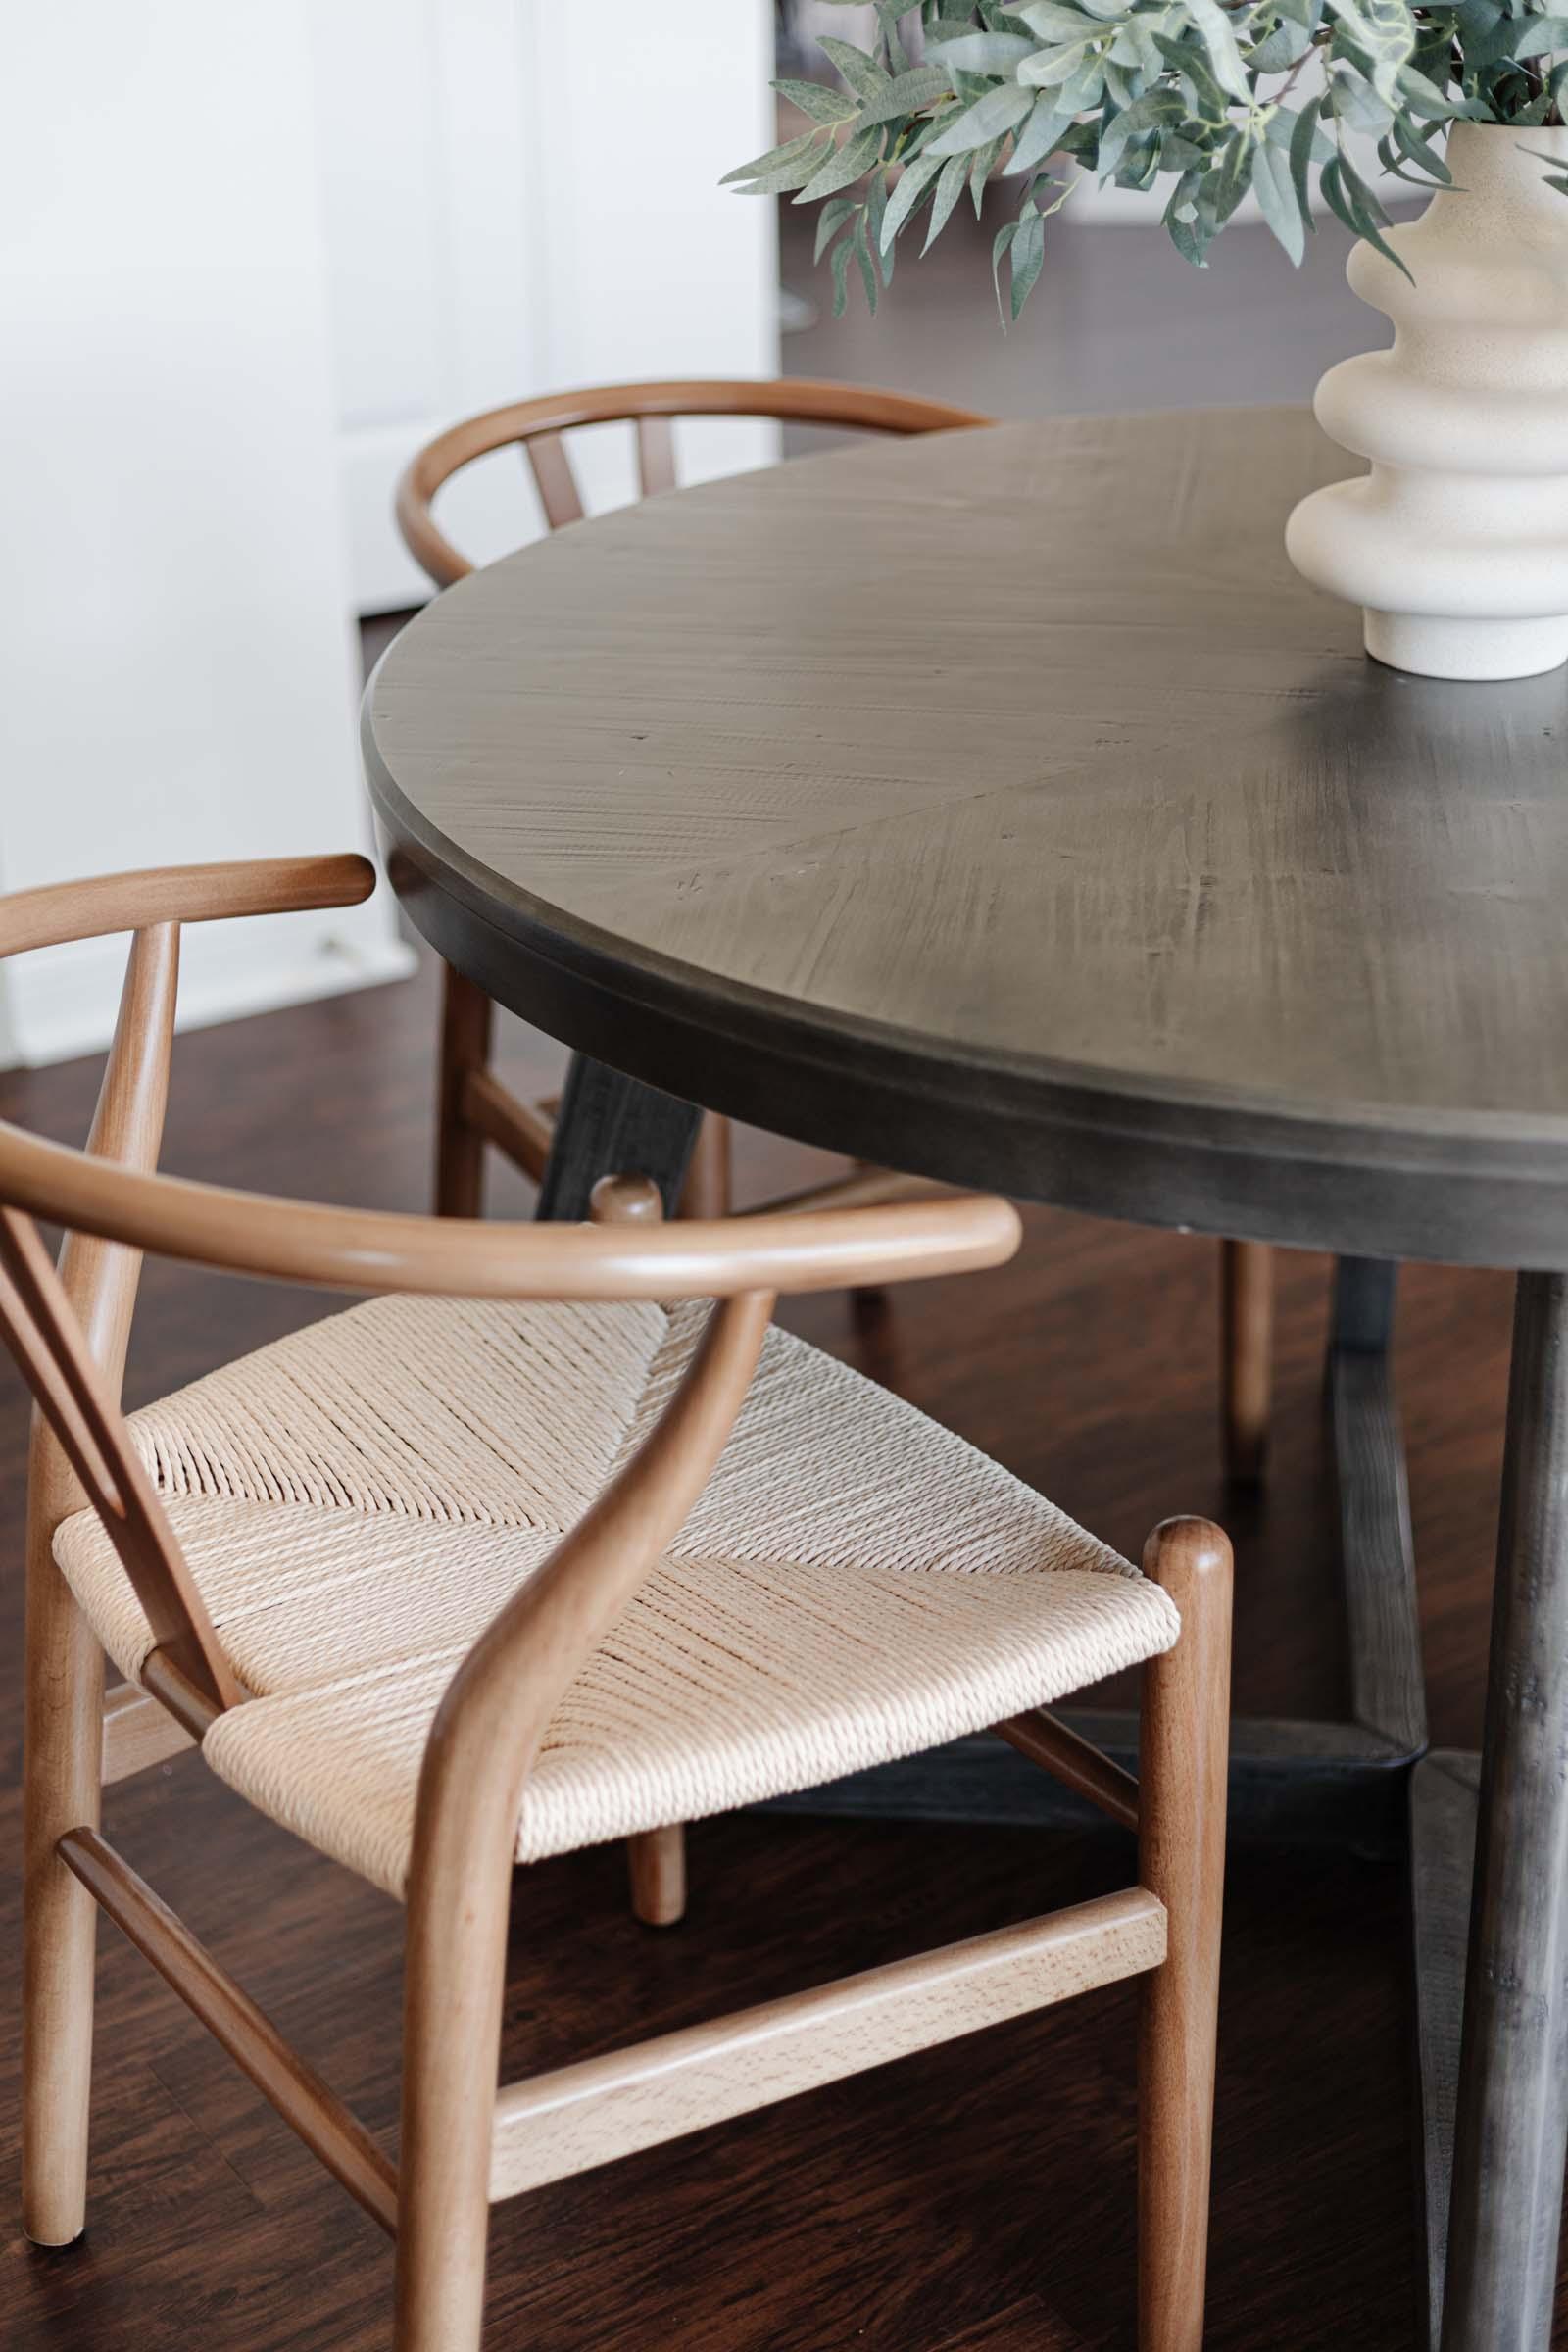 Poly and Bark Weave Chair, wishbone chair